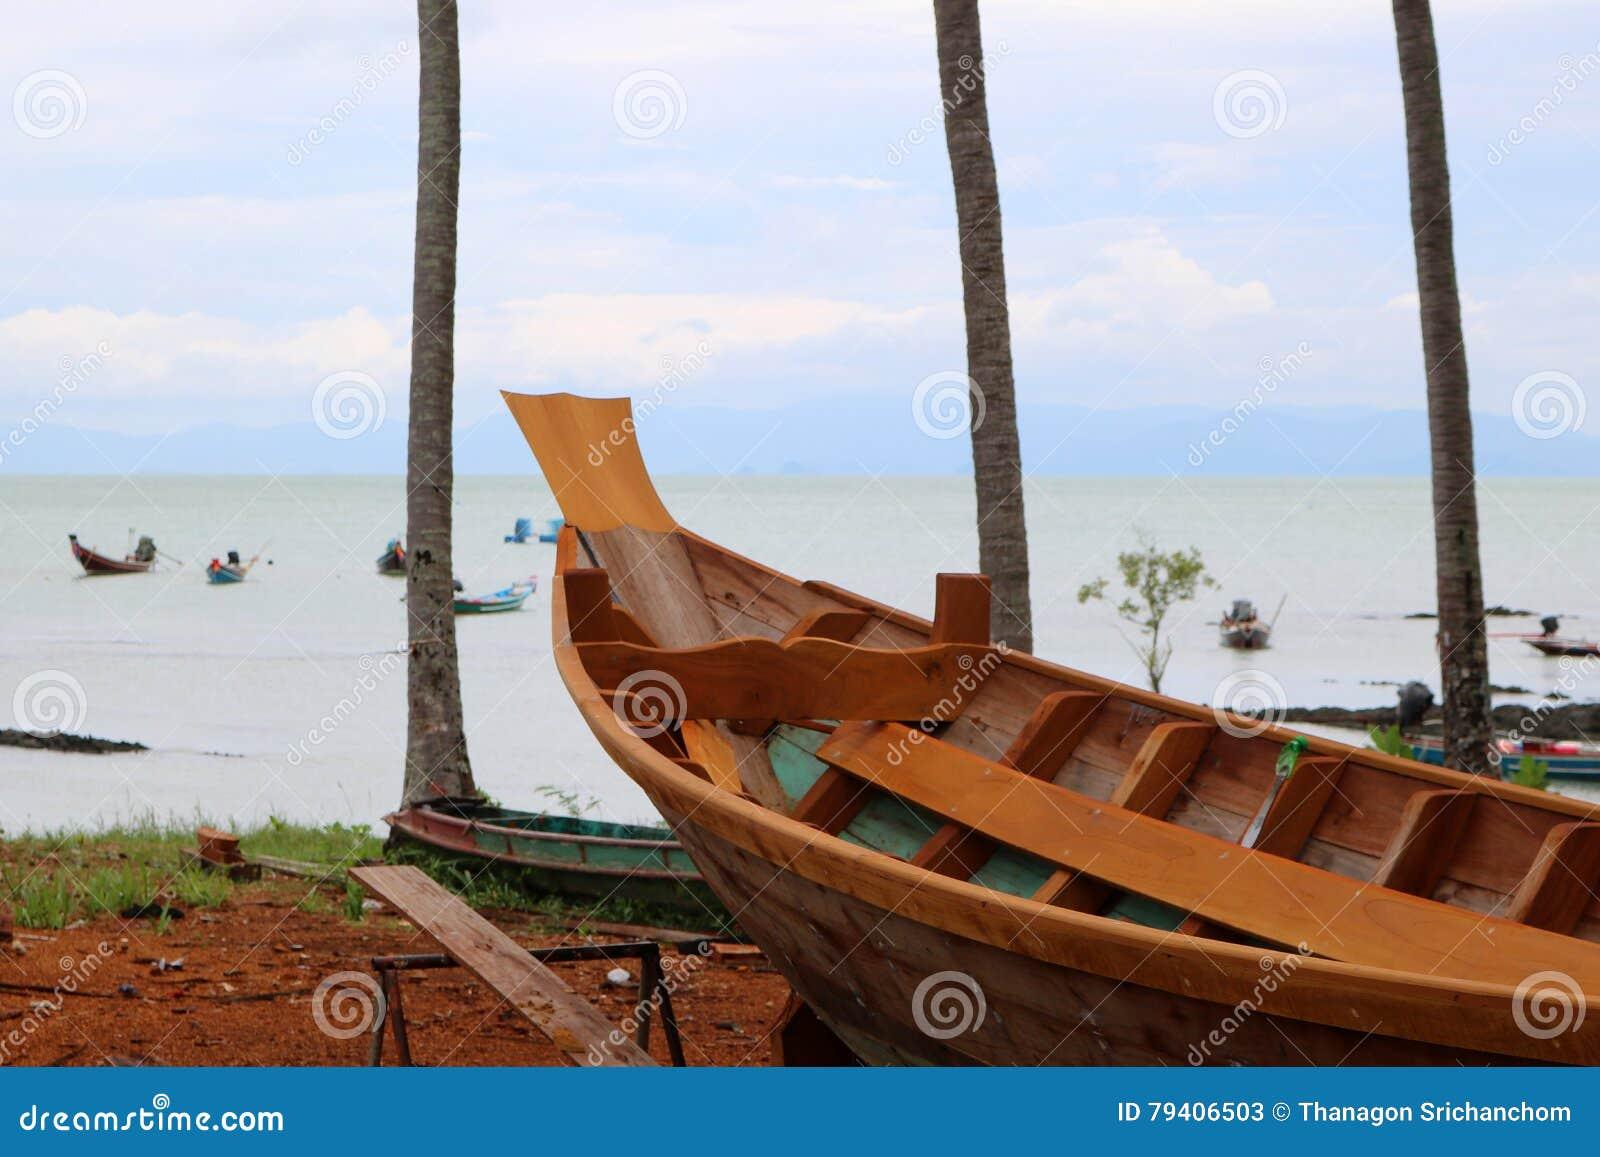 Wood shipbuilding near the sea.